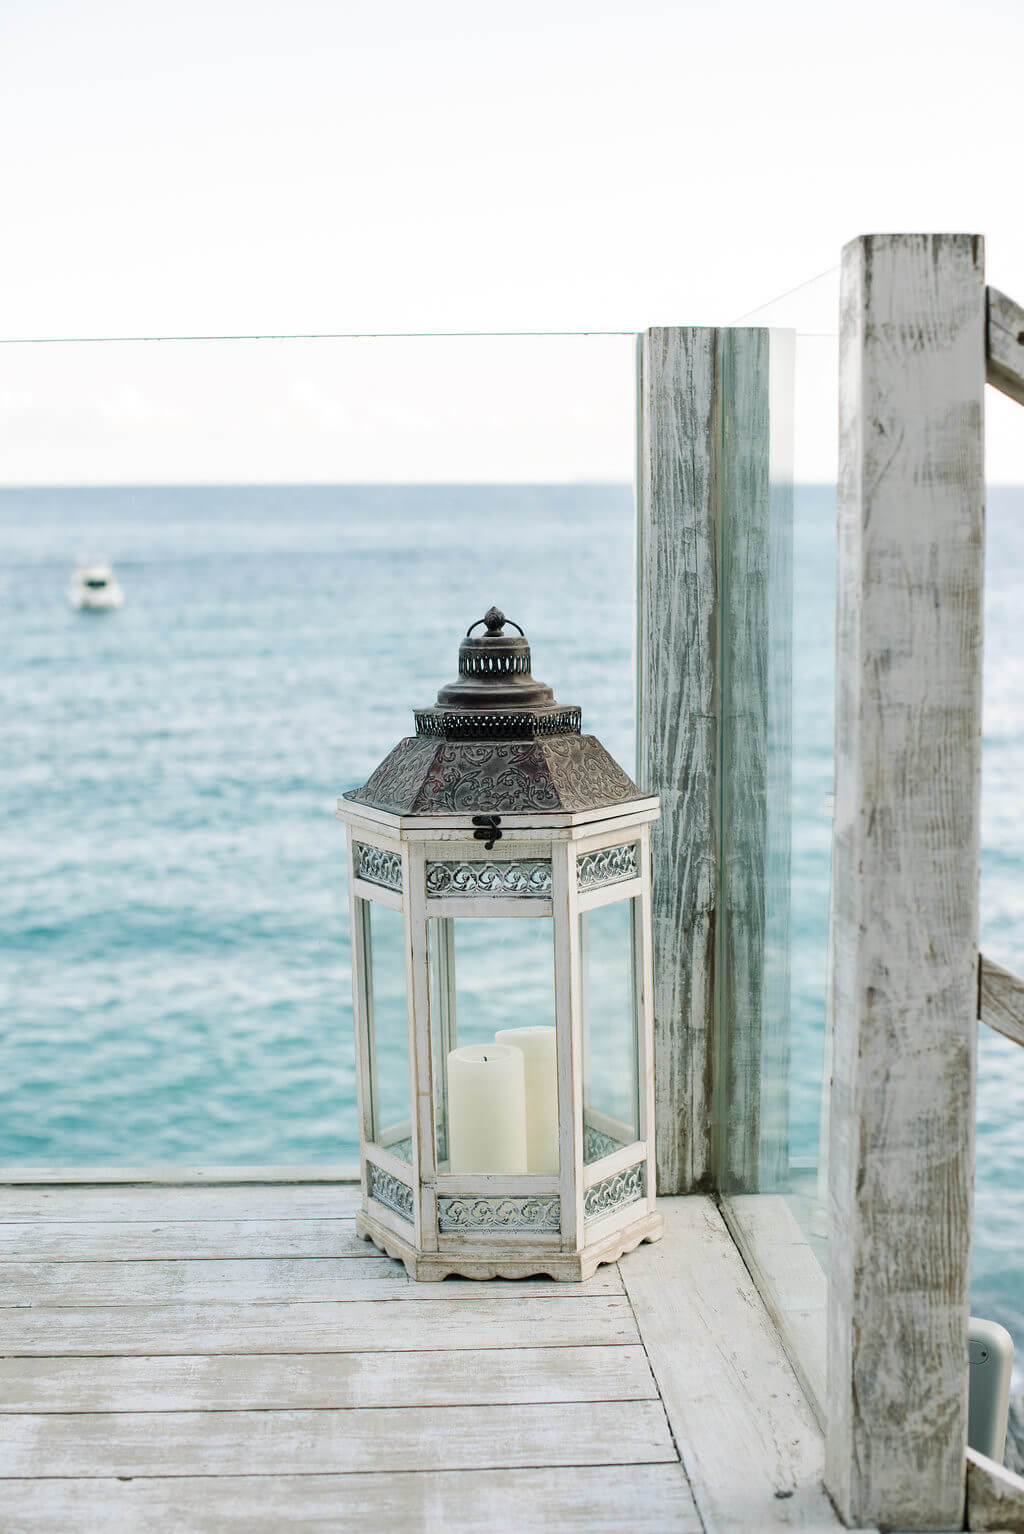 https://www.white-ibiza.com/wp-content/uploads/2020/03/ibiza-wedding-venues-amante-ibiza-2020-11.jpg